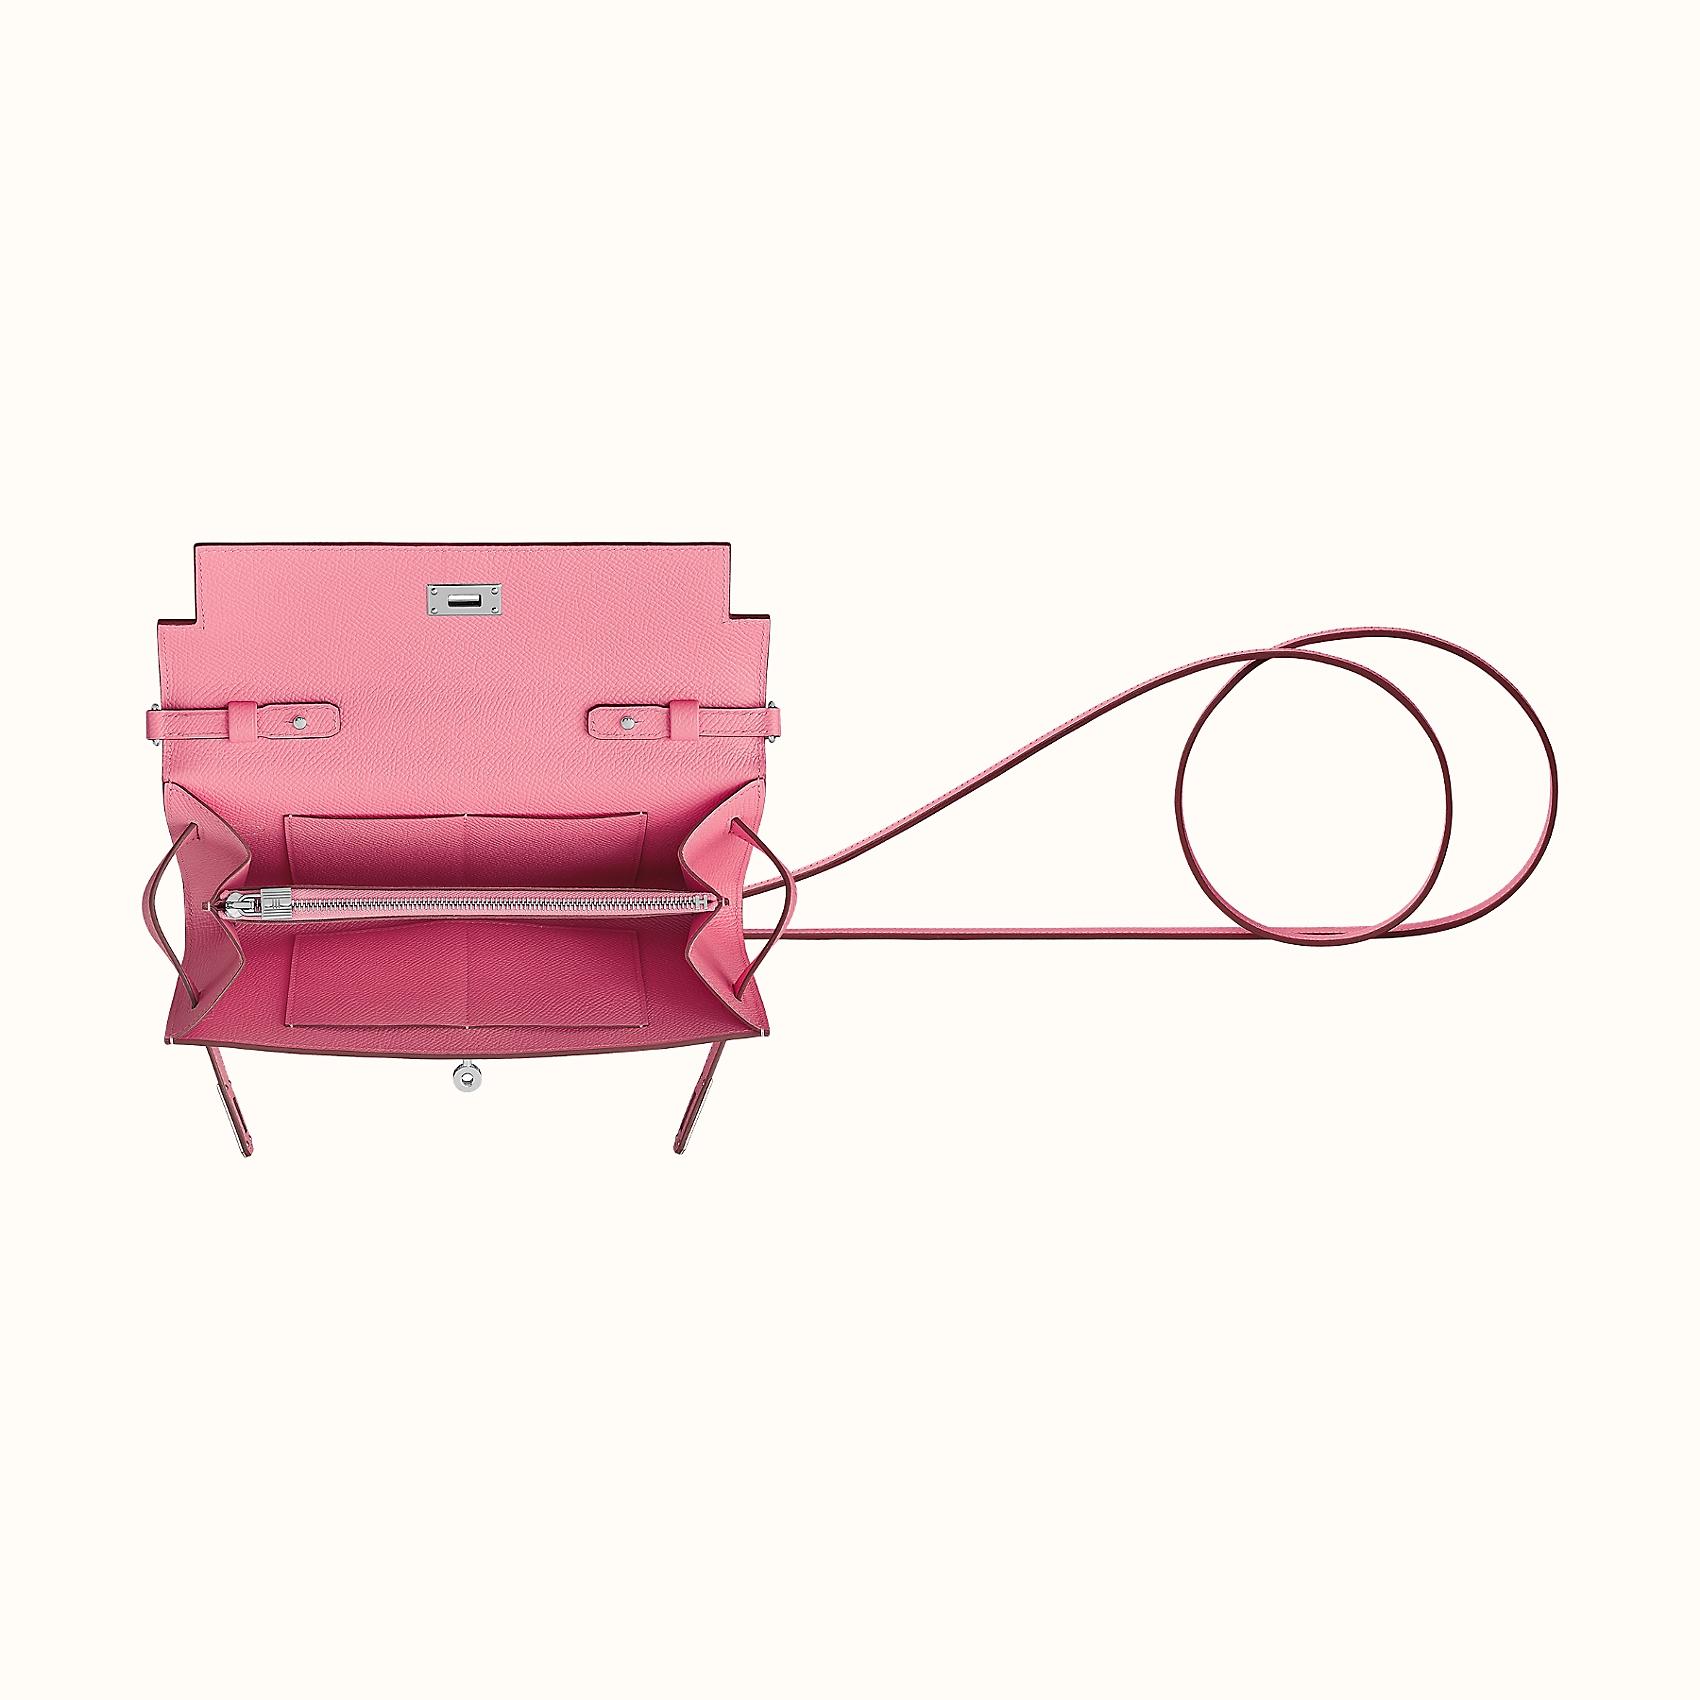 Hermes Portefeuille Kelly Classique To Go CK1Q Rose Confetti